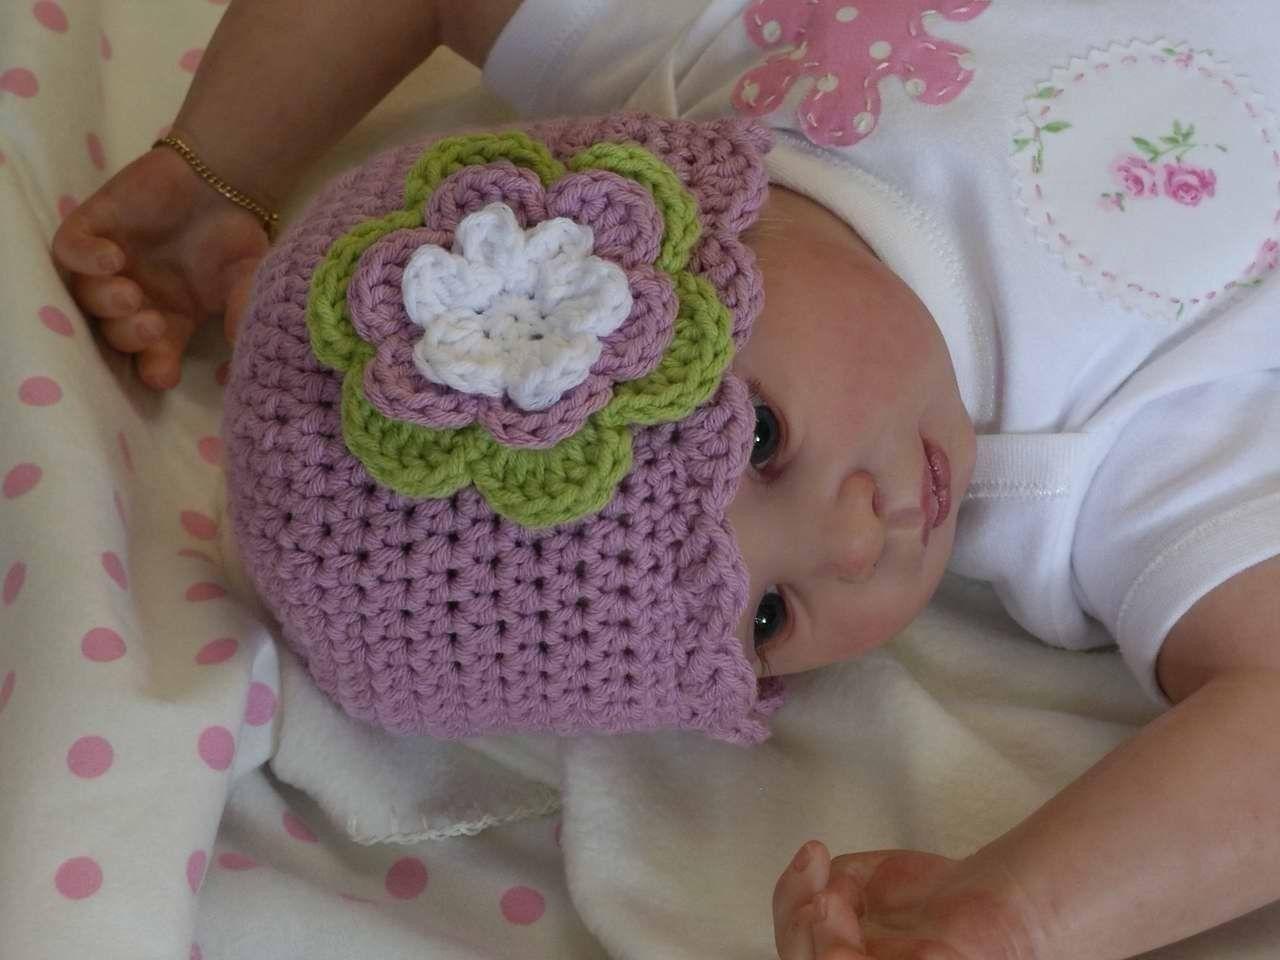 Baby crochet hat pattern easy peasy shell trim baby hat crochet baby crochet hat pattern easy peasy shell trim baby hat crochet pattern no103 eight sizes bankloansurffo Gallery